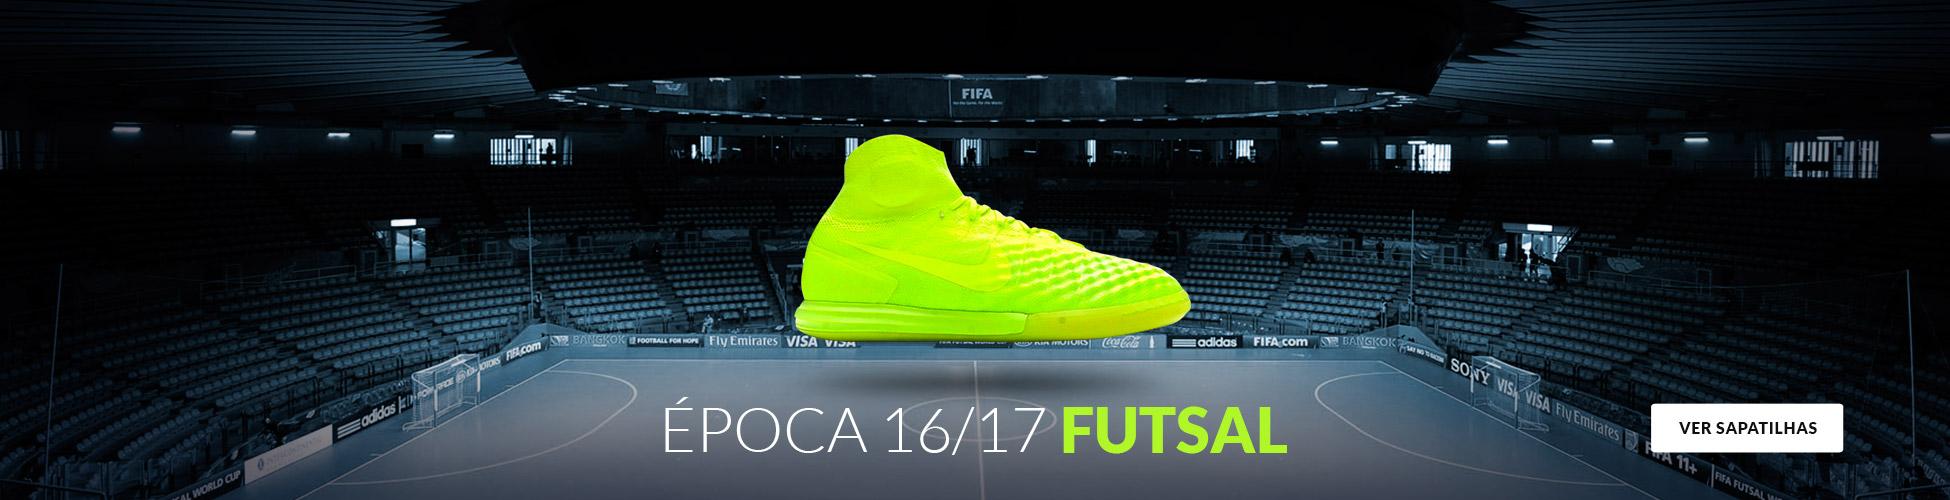 Temporada Futsal PT